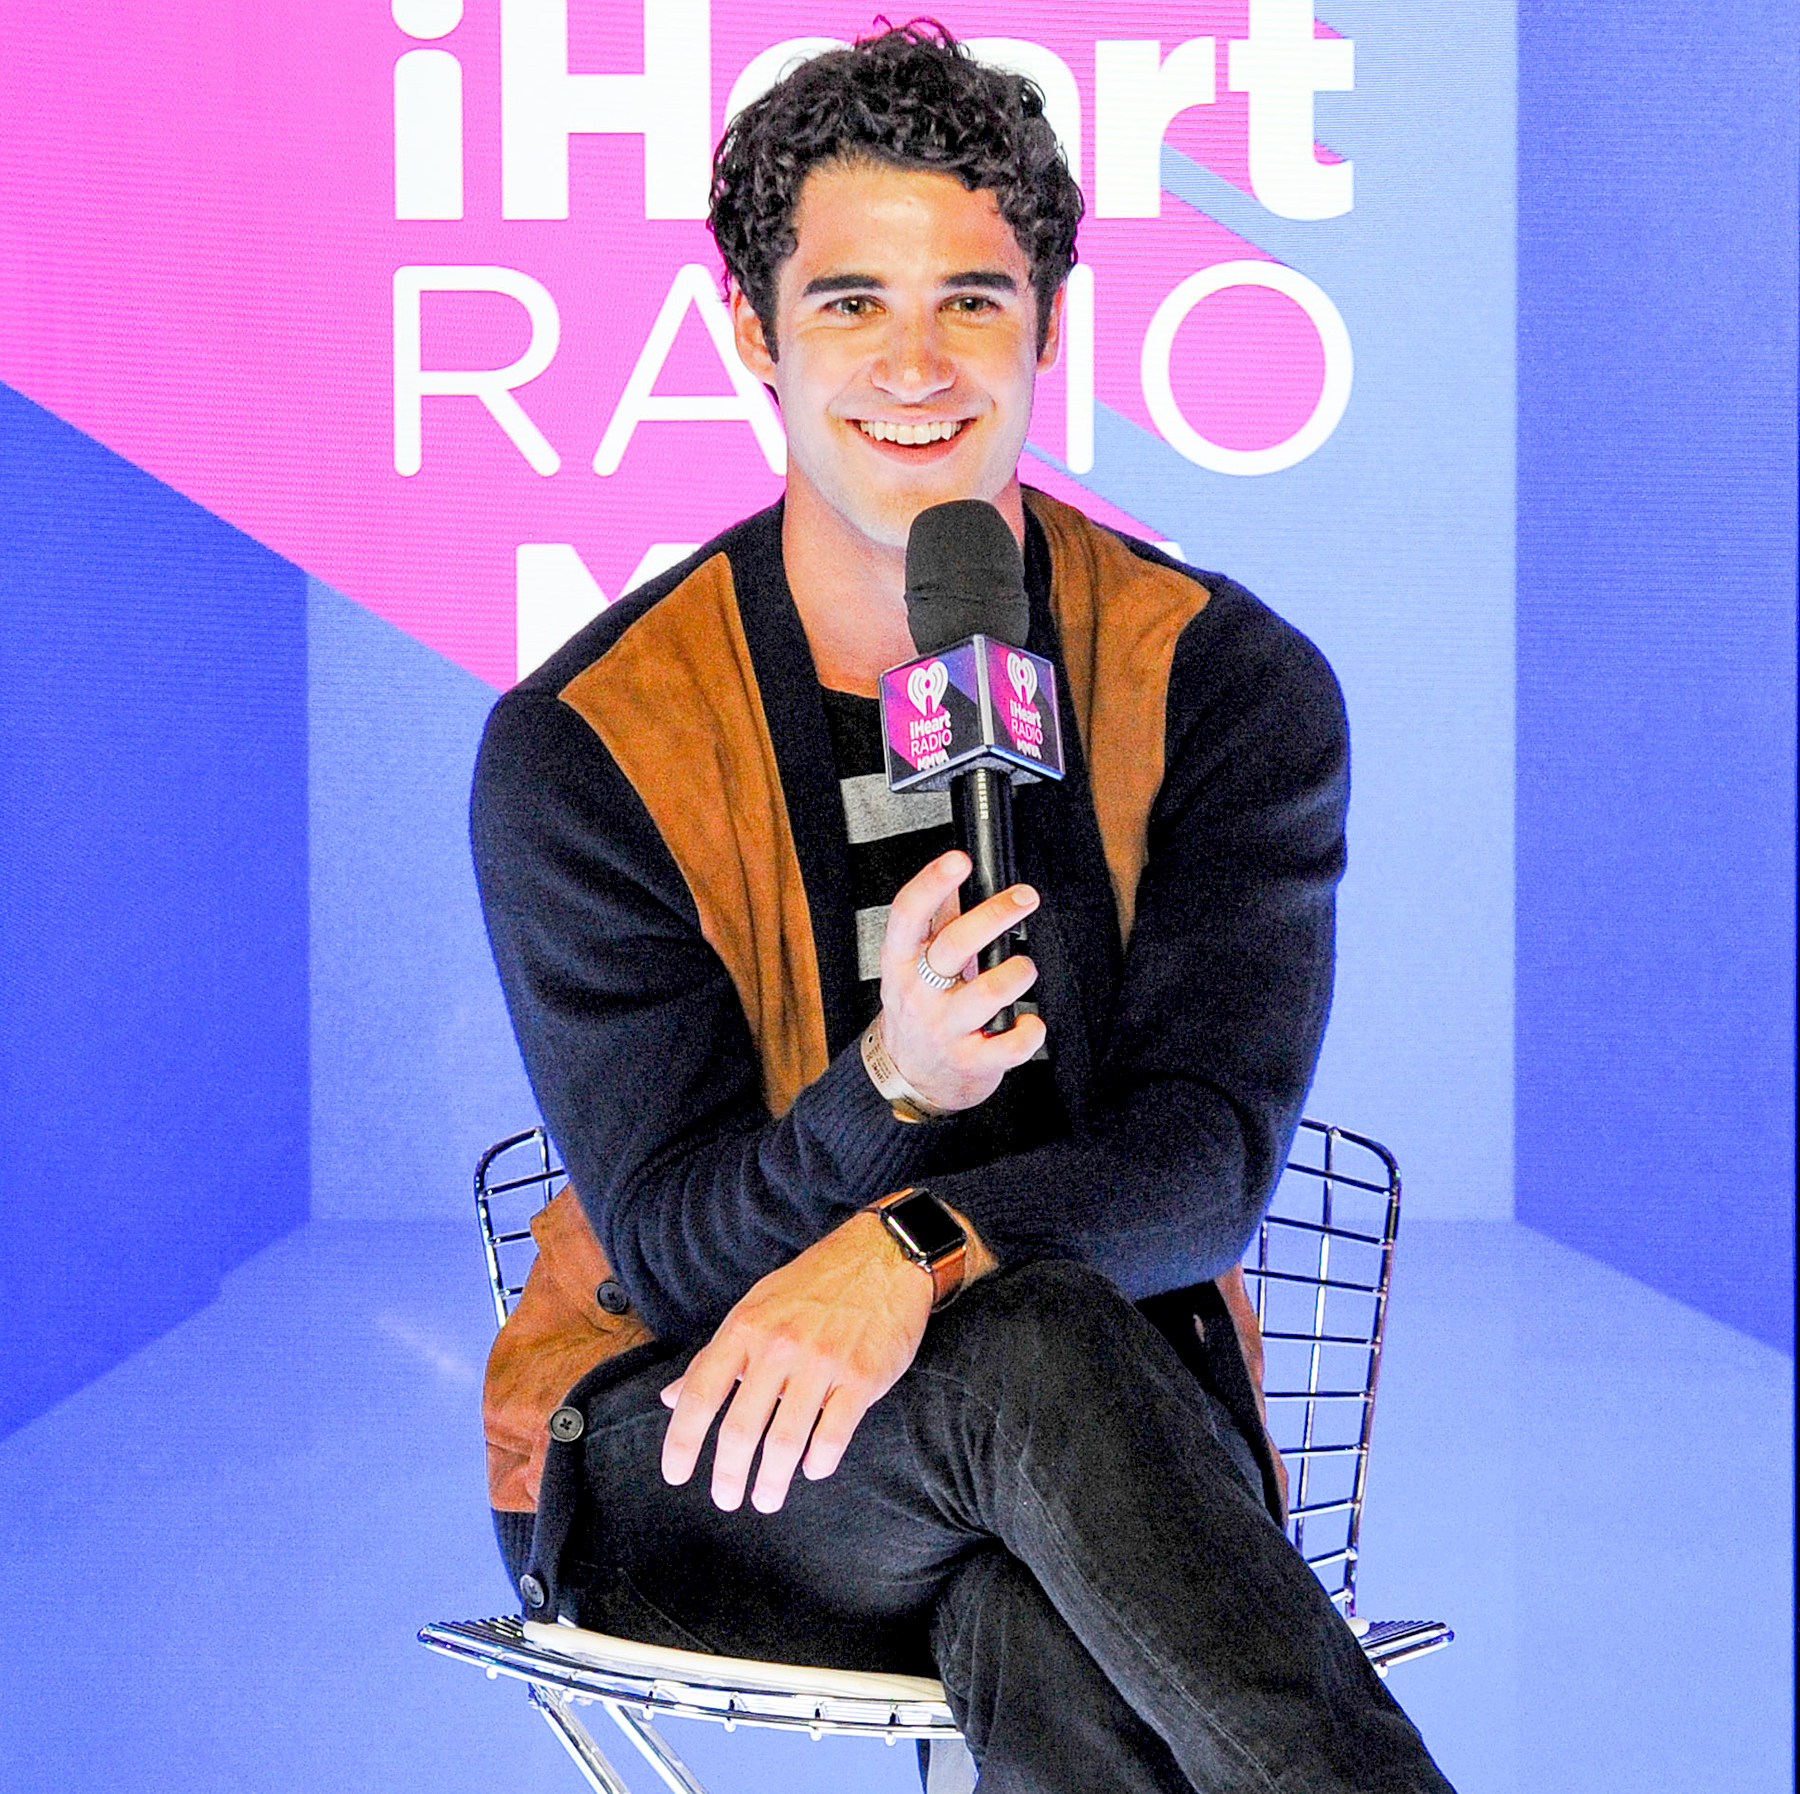 Darren Criss attends the 2017 iHeartRadio MuchMusic Video Awards - Press Room on June 18, 2017 in Toronto, Canada.